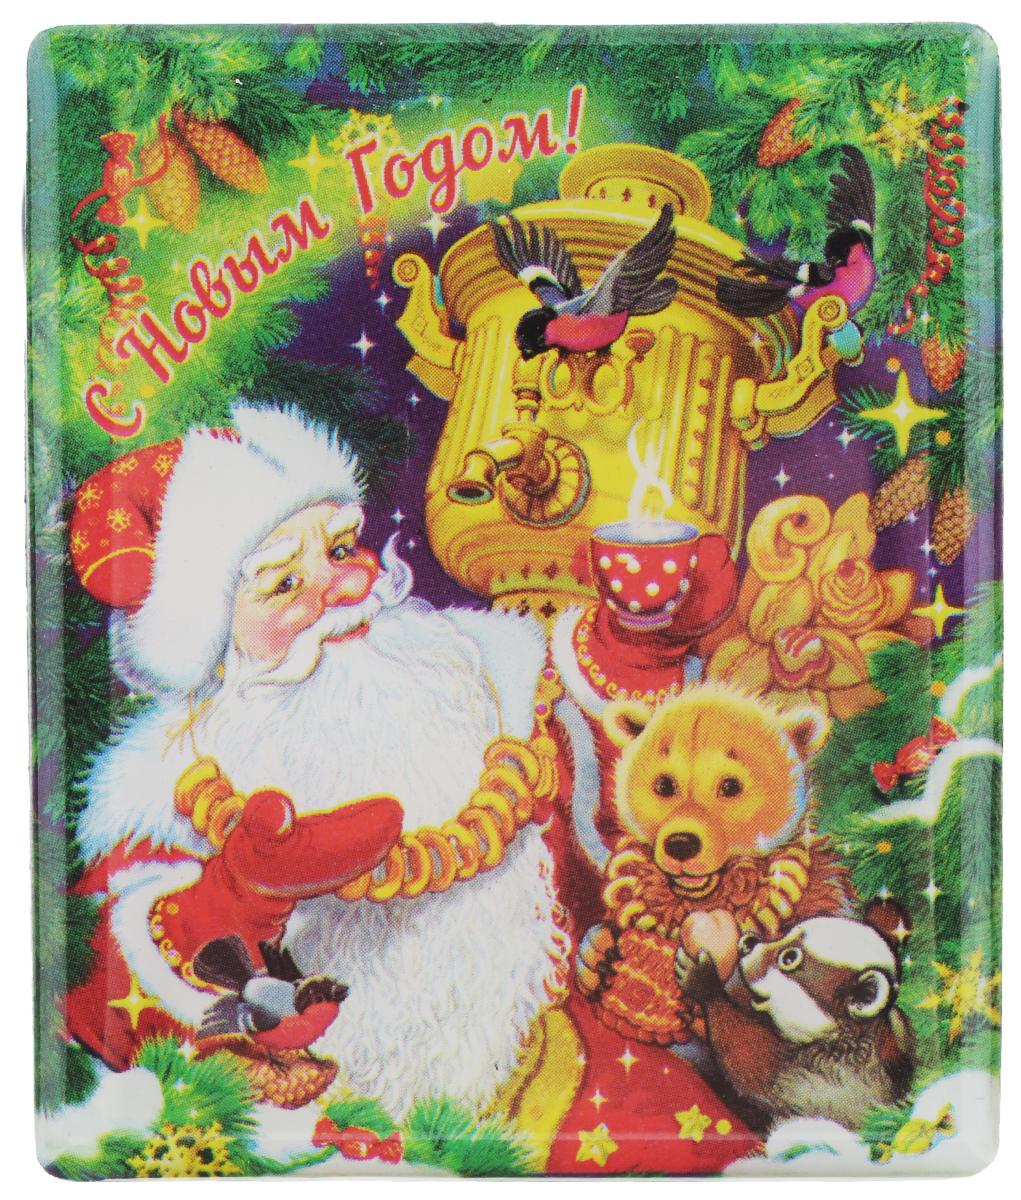 "Магнит Феникс-презент ""Дед Мороз с самоваром"", 6 x 5 см"